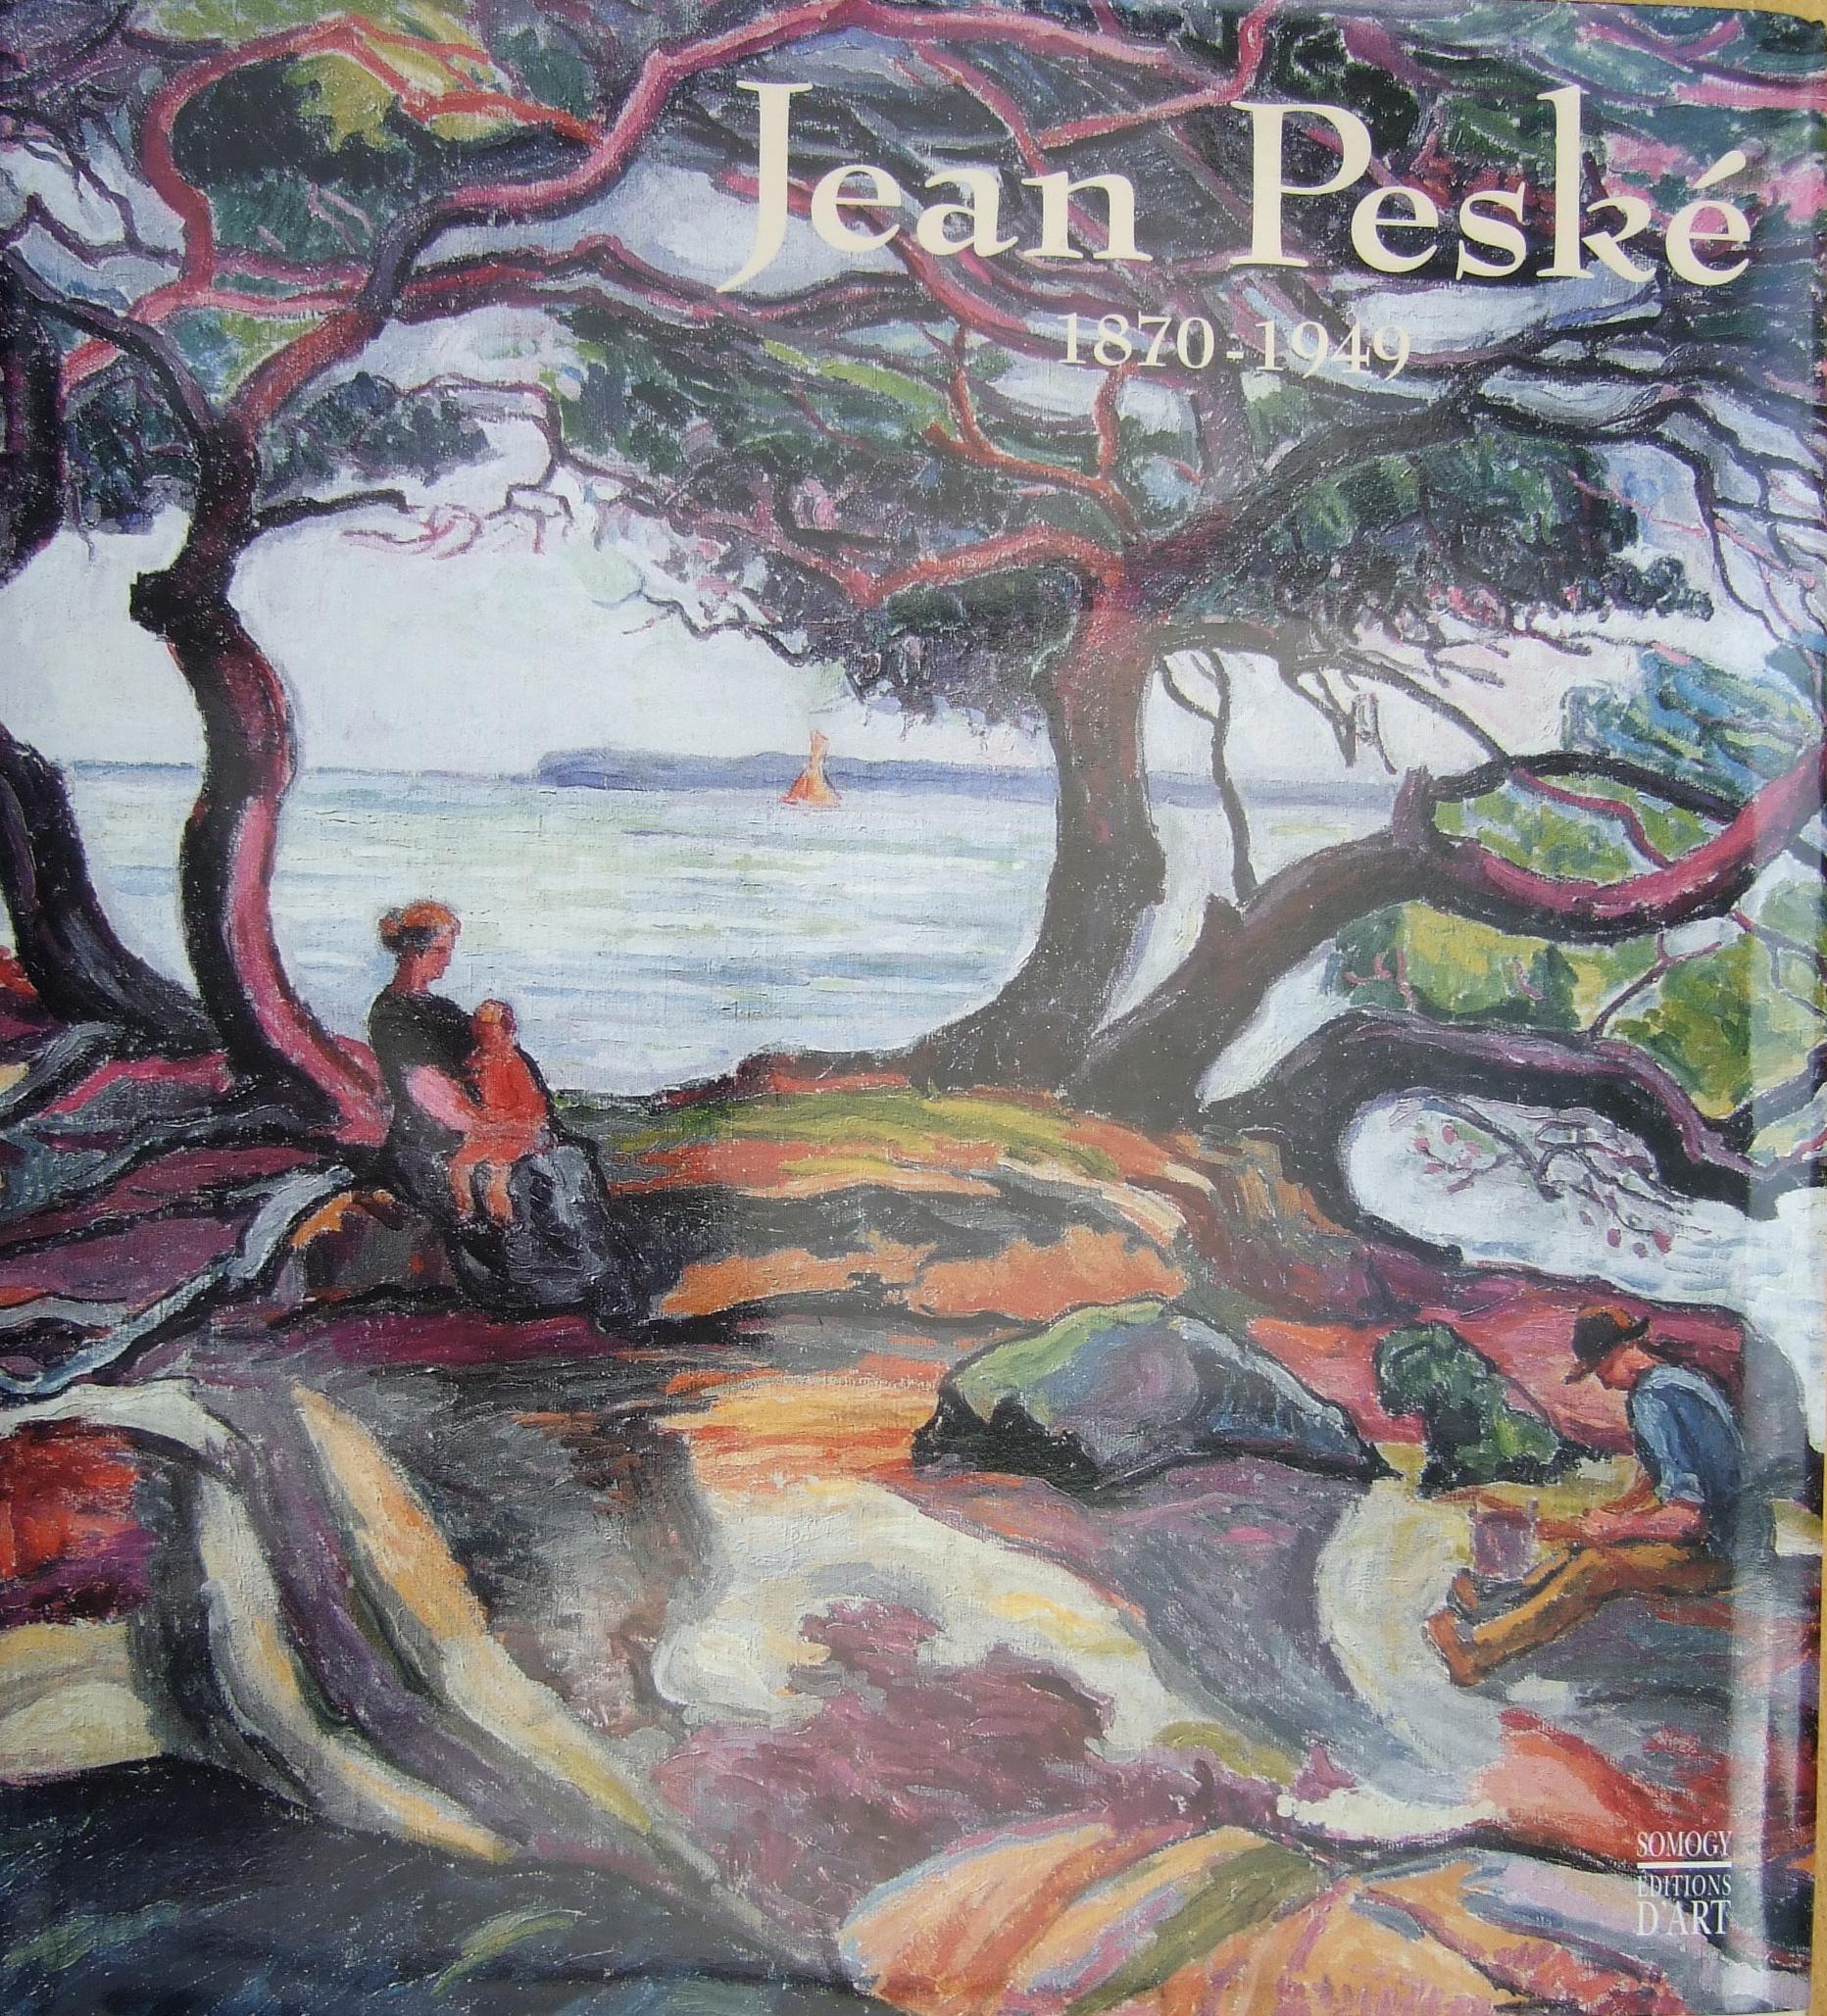 Jean Peske, Samogy editions d'art. Paris. 2002.